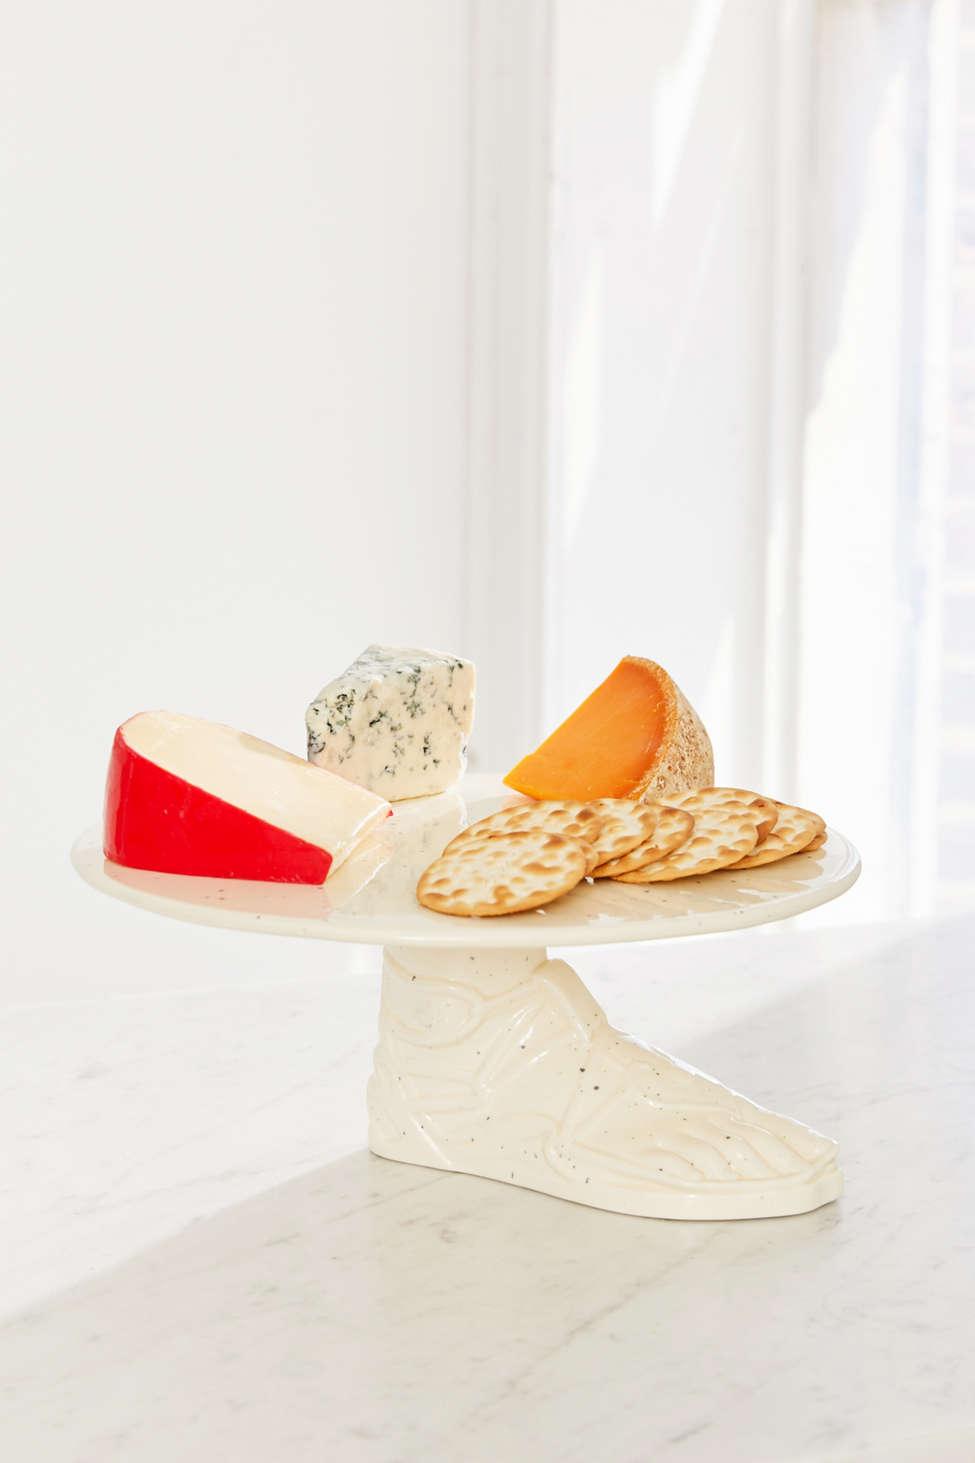 Slide View: 1: DOIY Design Hestia Food Stand